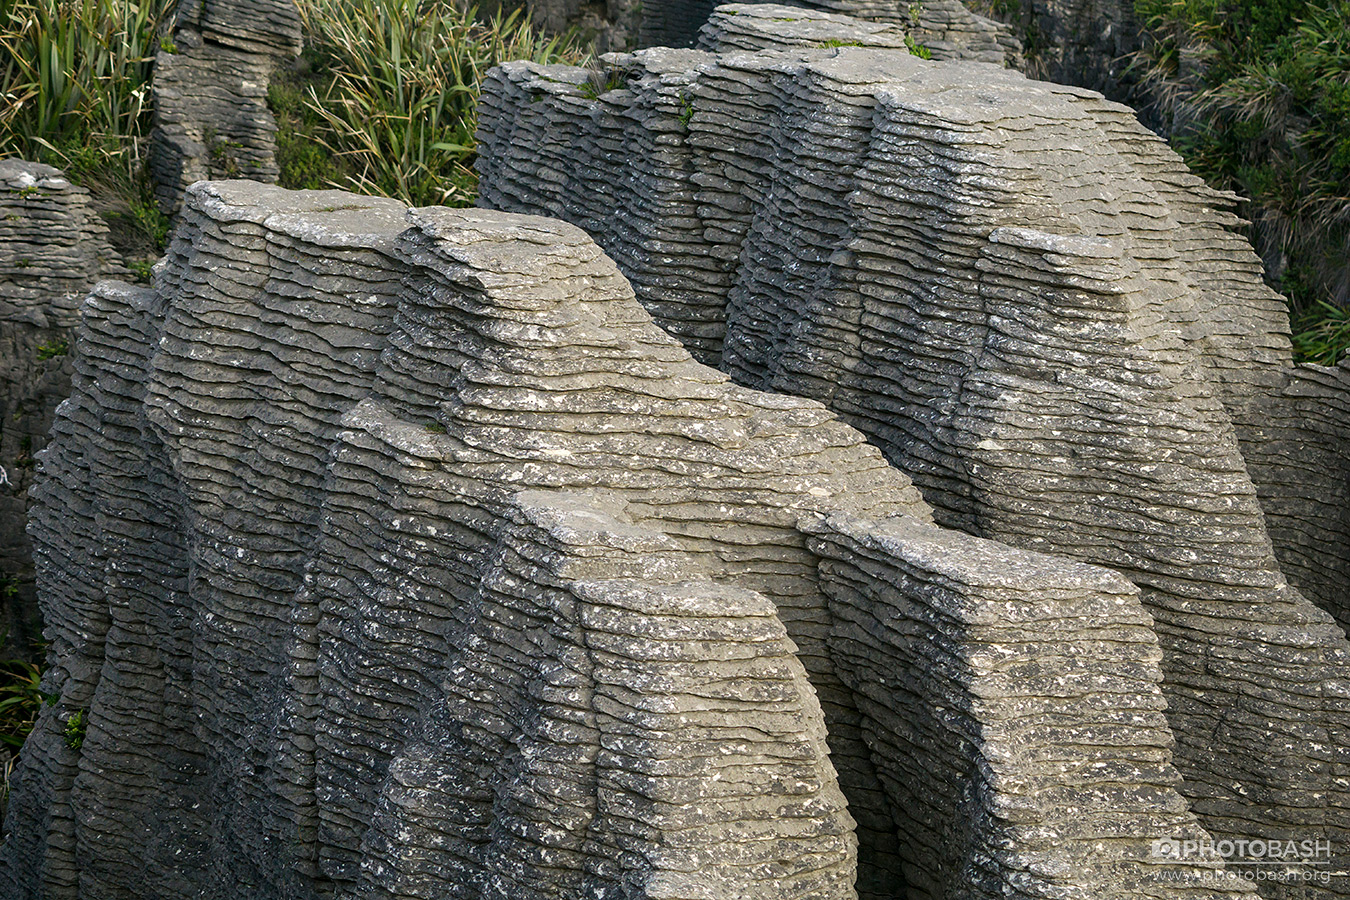 Eroded-Coastline-Rock-Formations.jpg